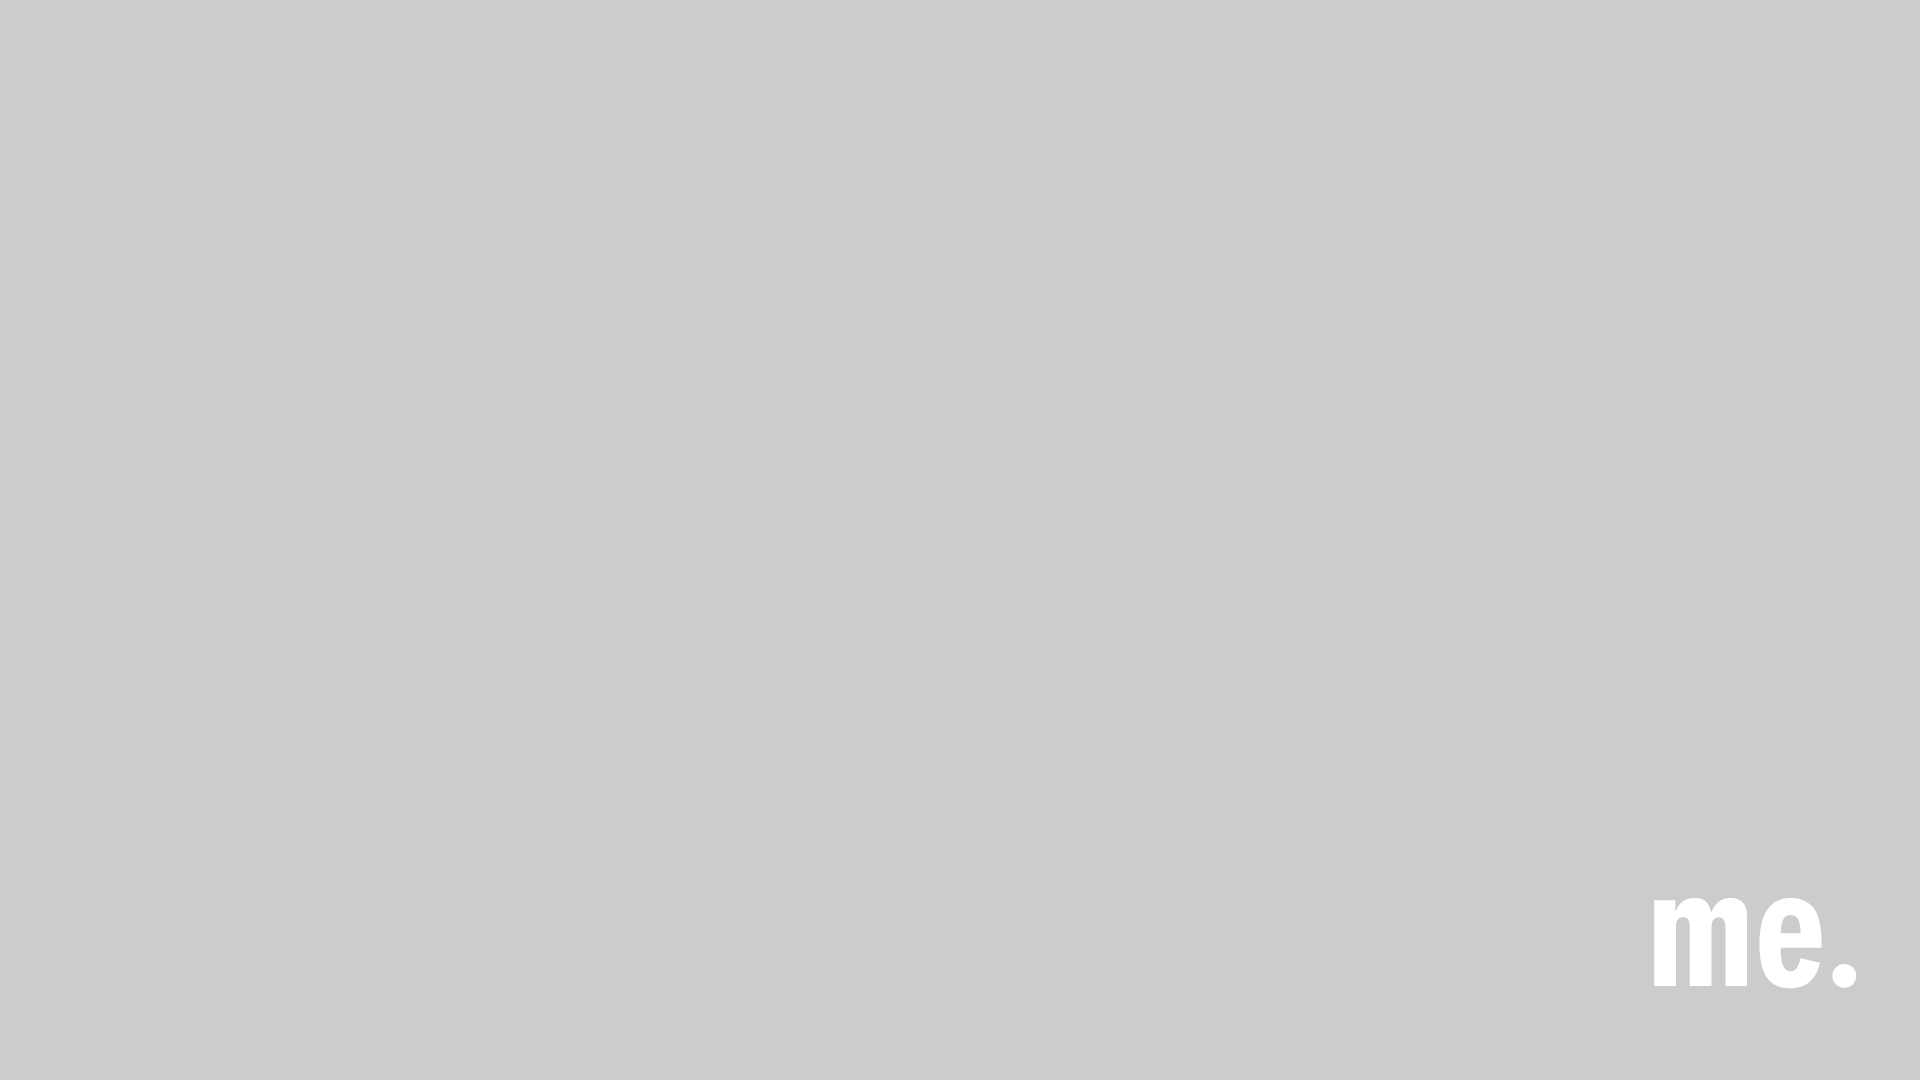 20. Tech N9ne (Aaron Dontez Yates): 6 Millionen US-Dollar